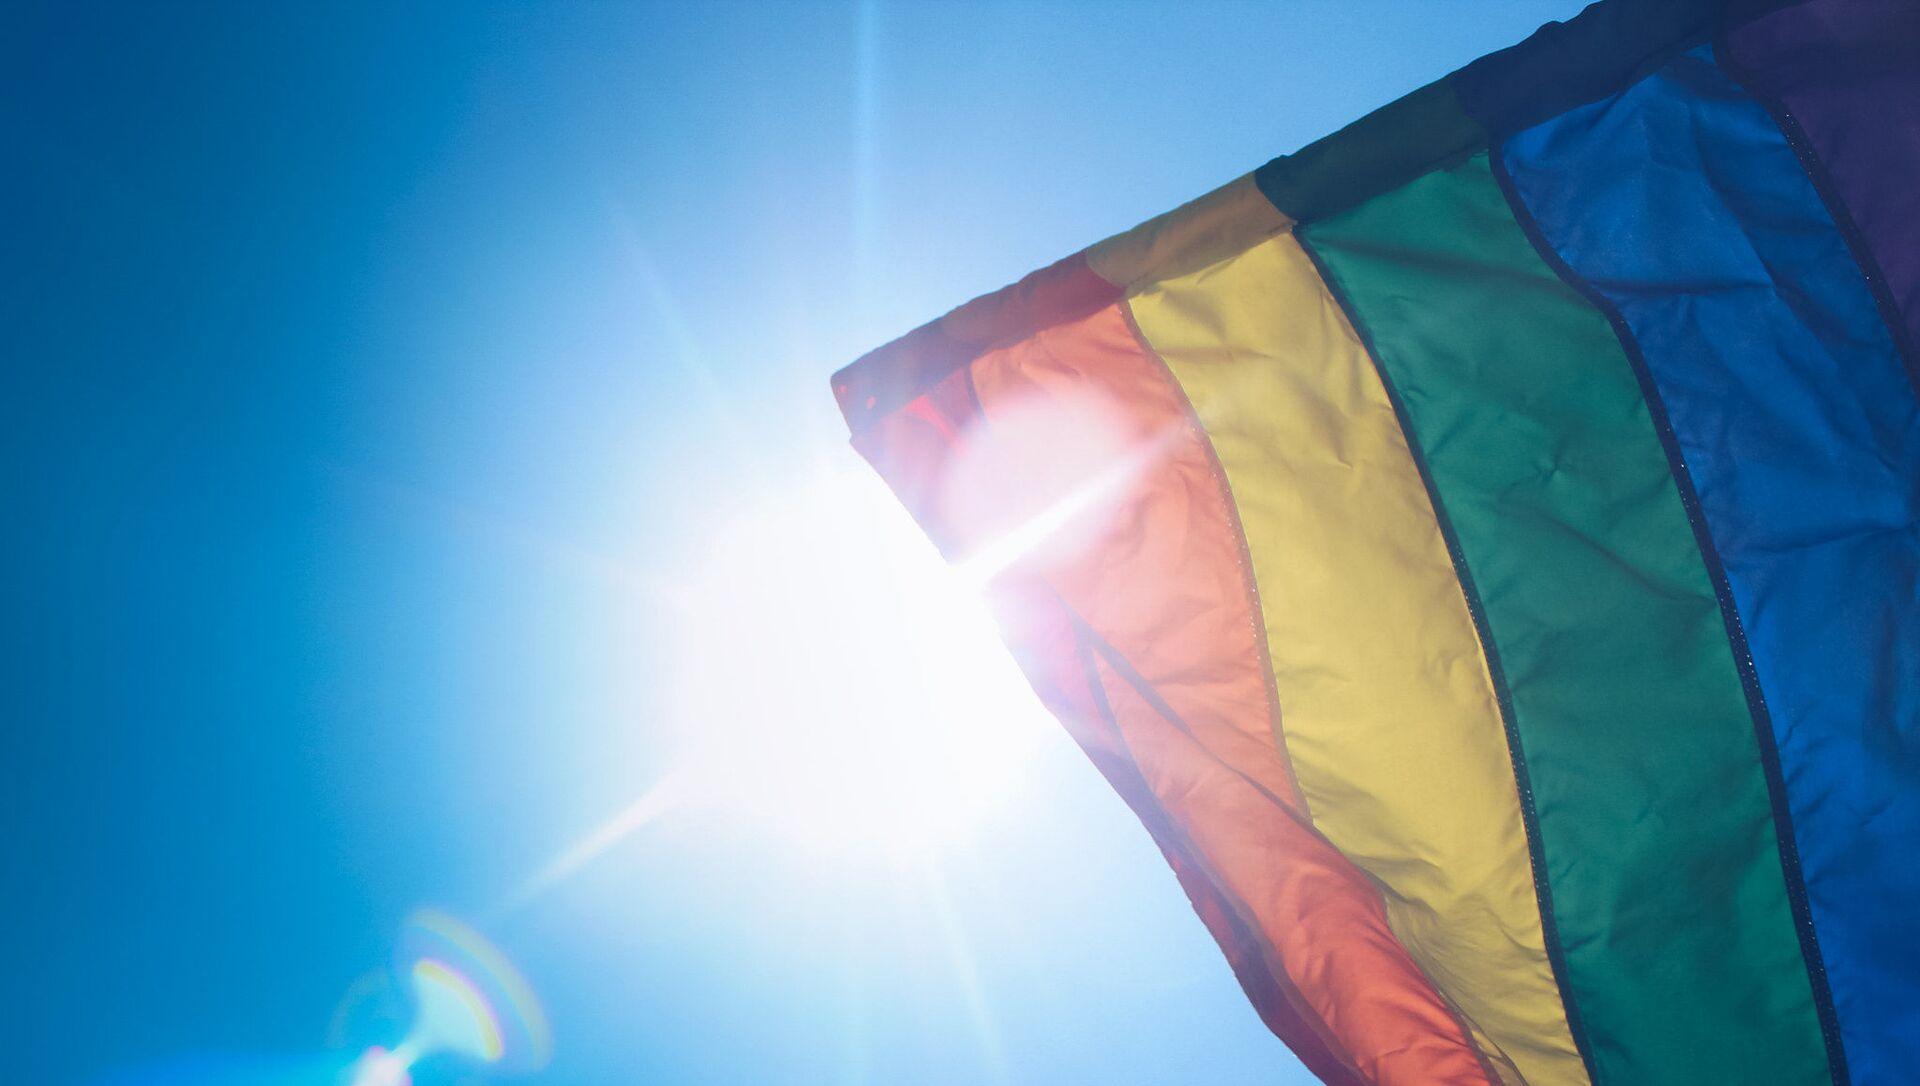 LGBT Flag - Sputnik International, 1920, 28.07.2021